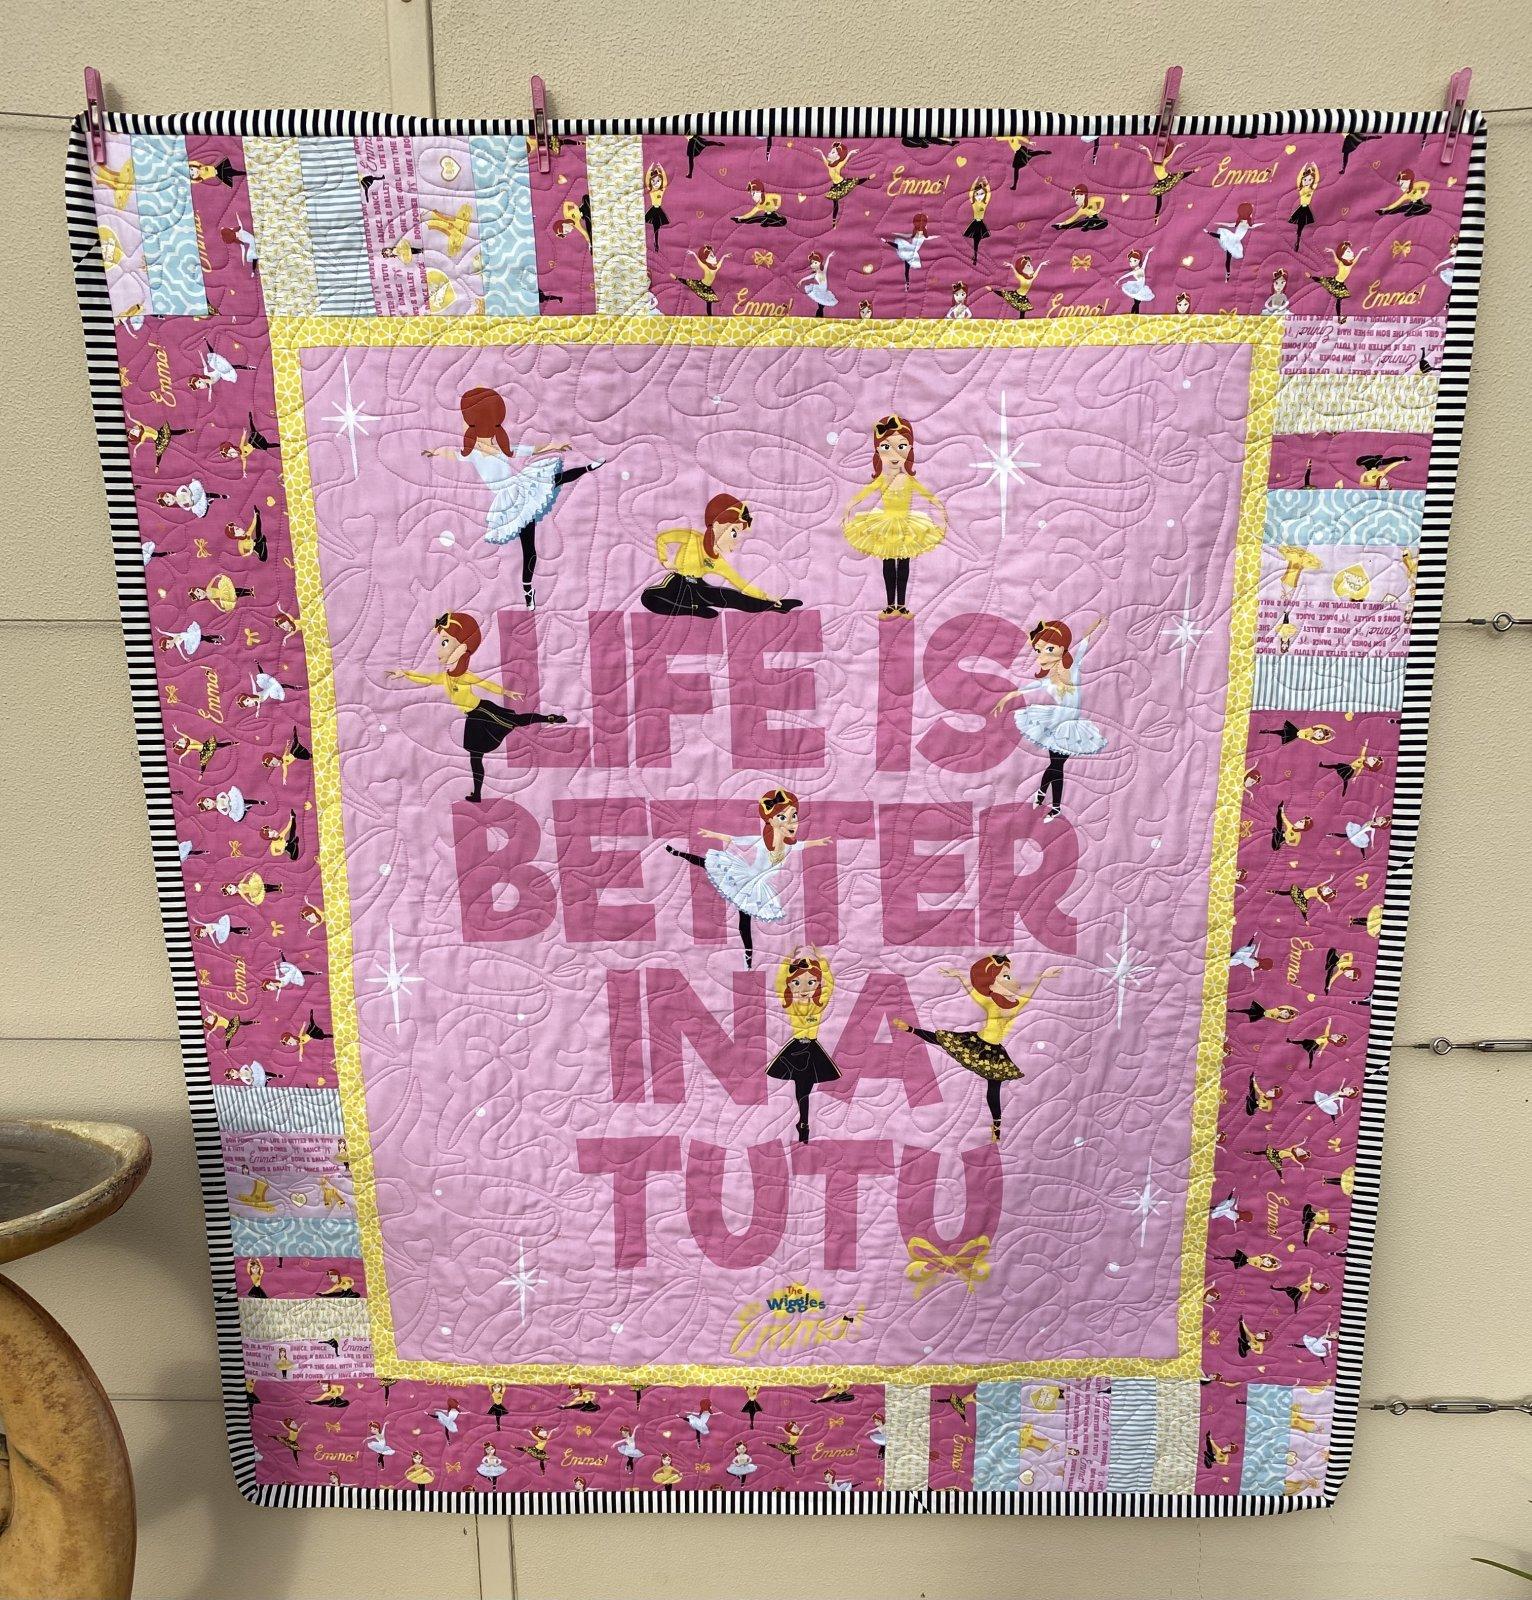 Emma in a Tutu Quilt Kit